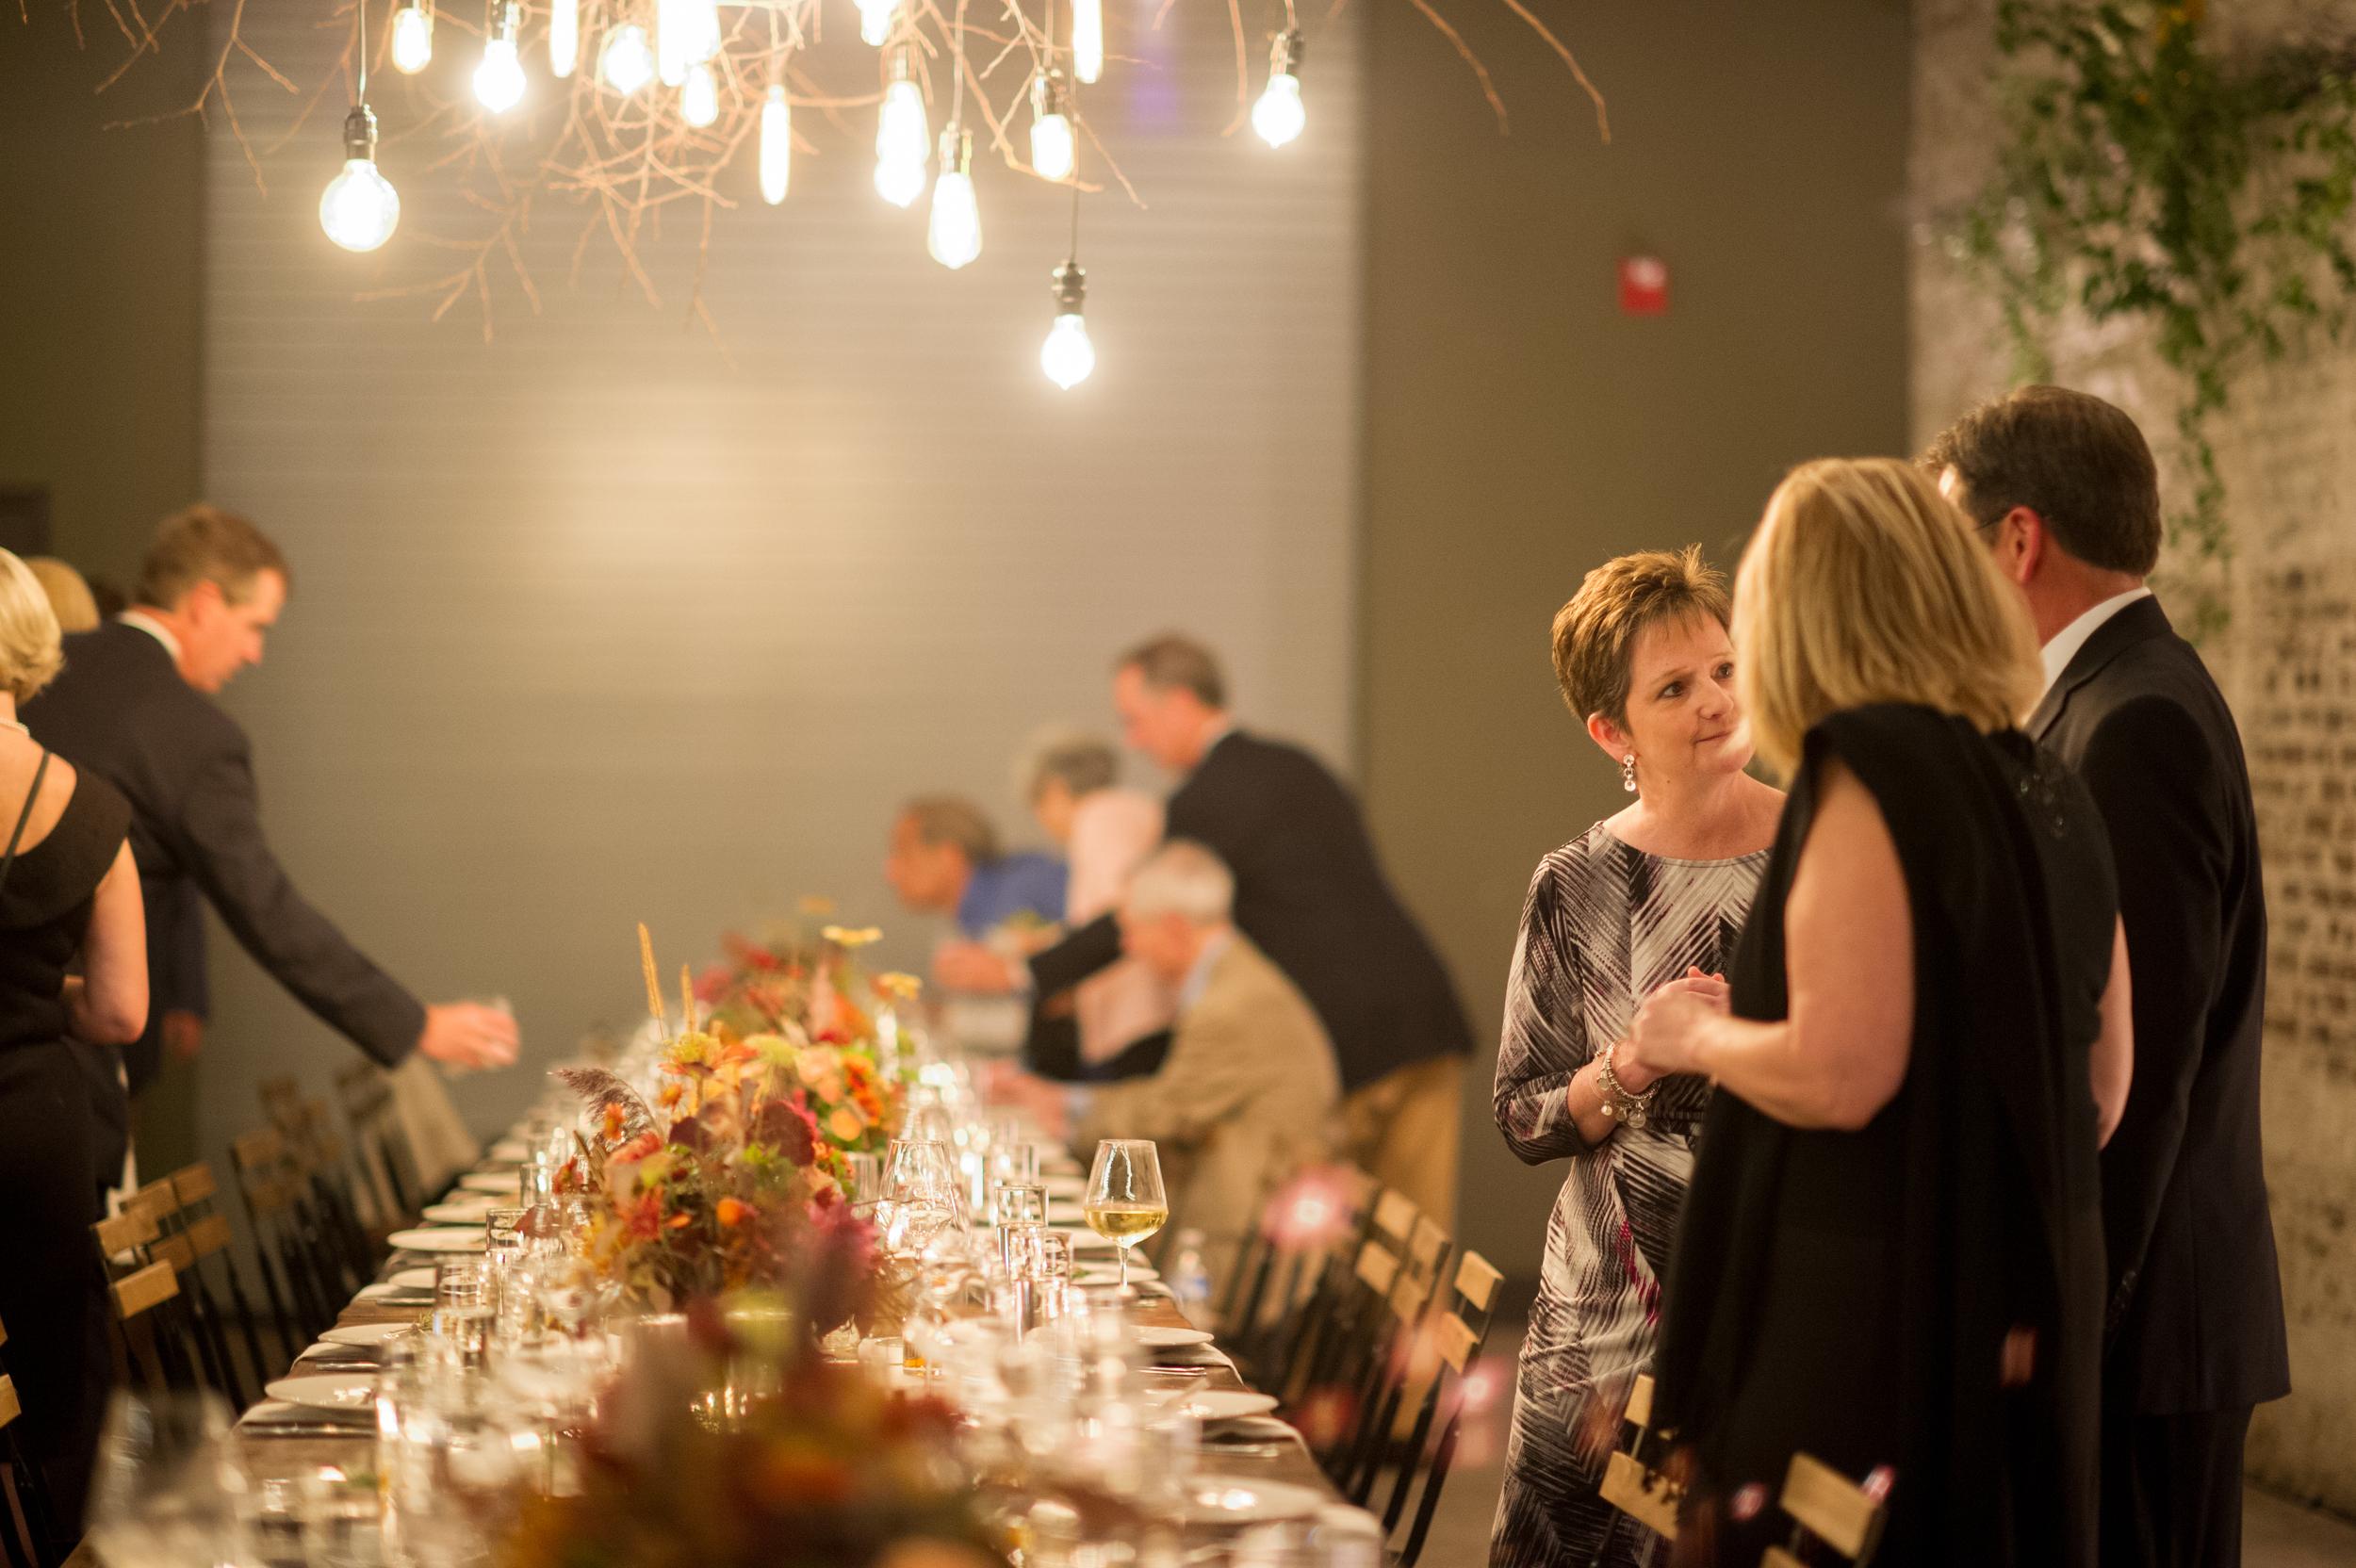 Nelson's Green Brier Distillery - Southern Social - Nashville Wedding Planner